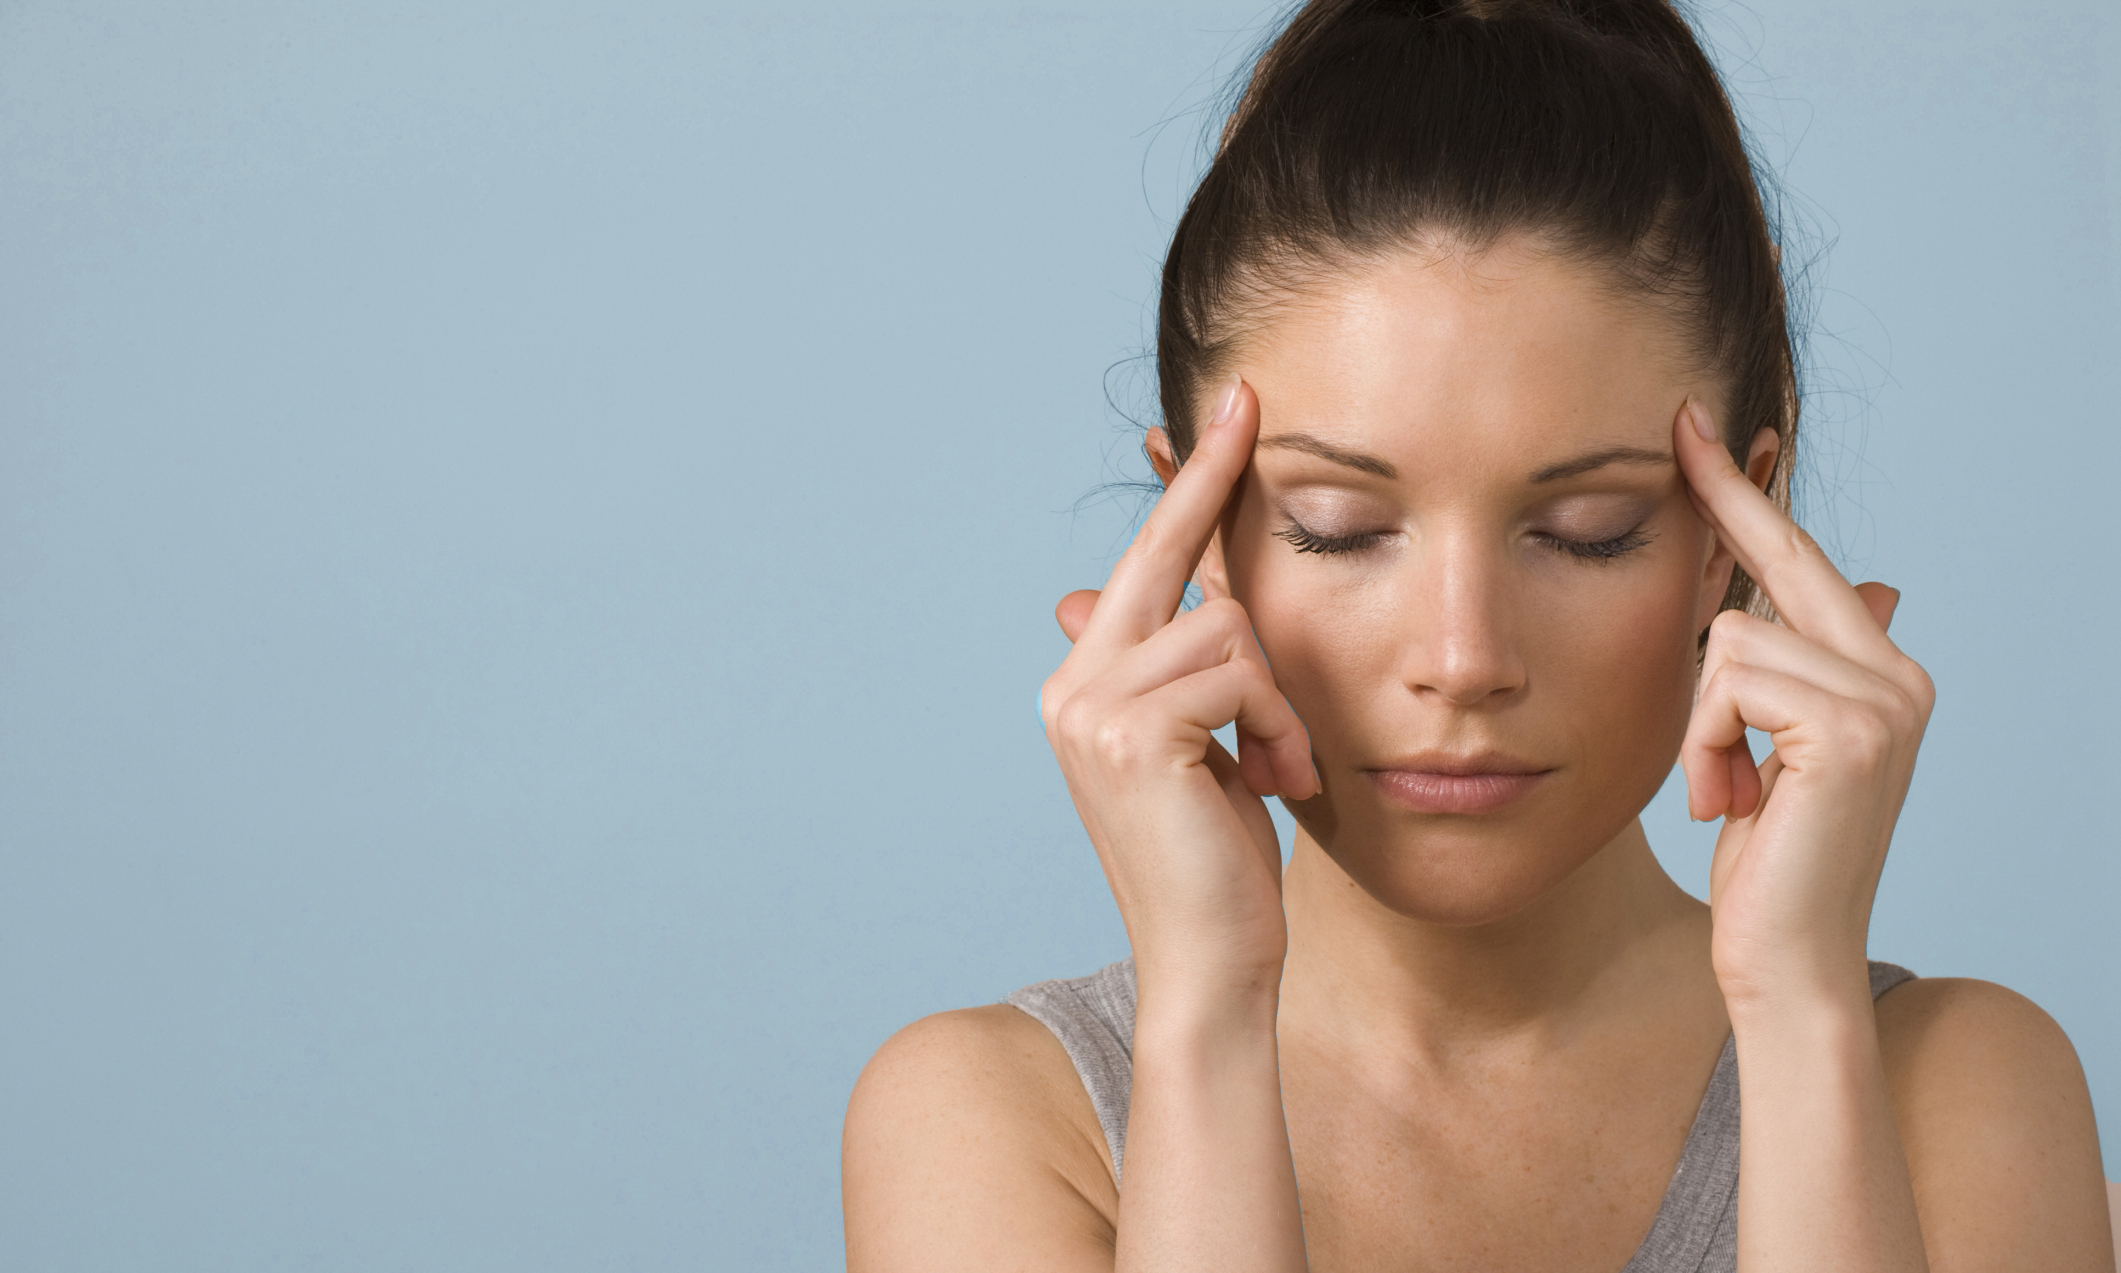 Facial neuralgia pain topamax